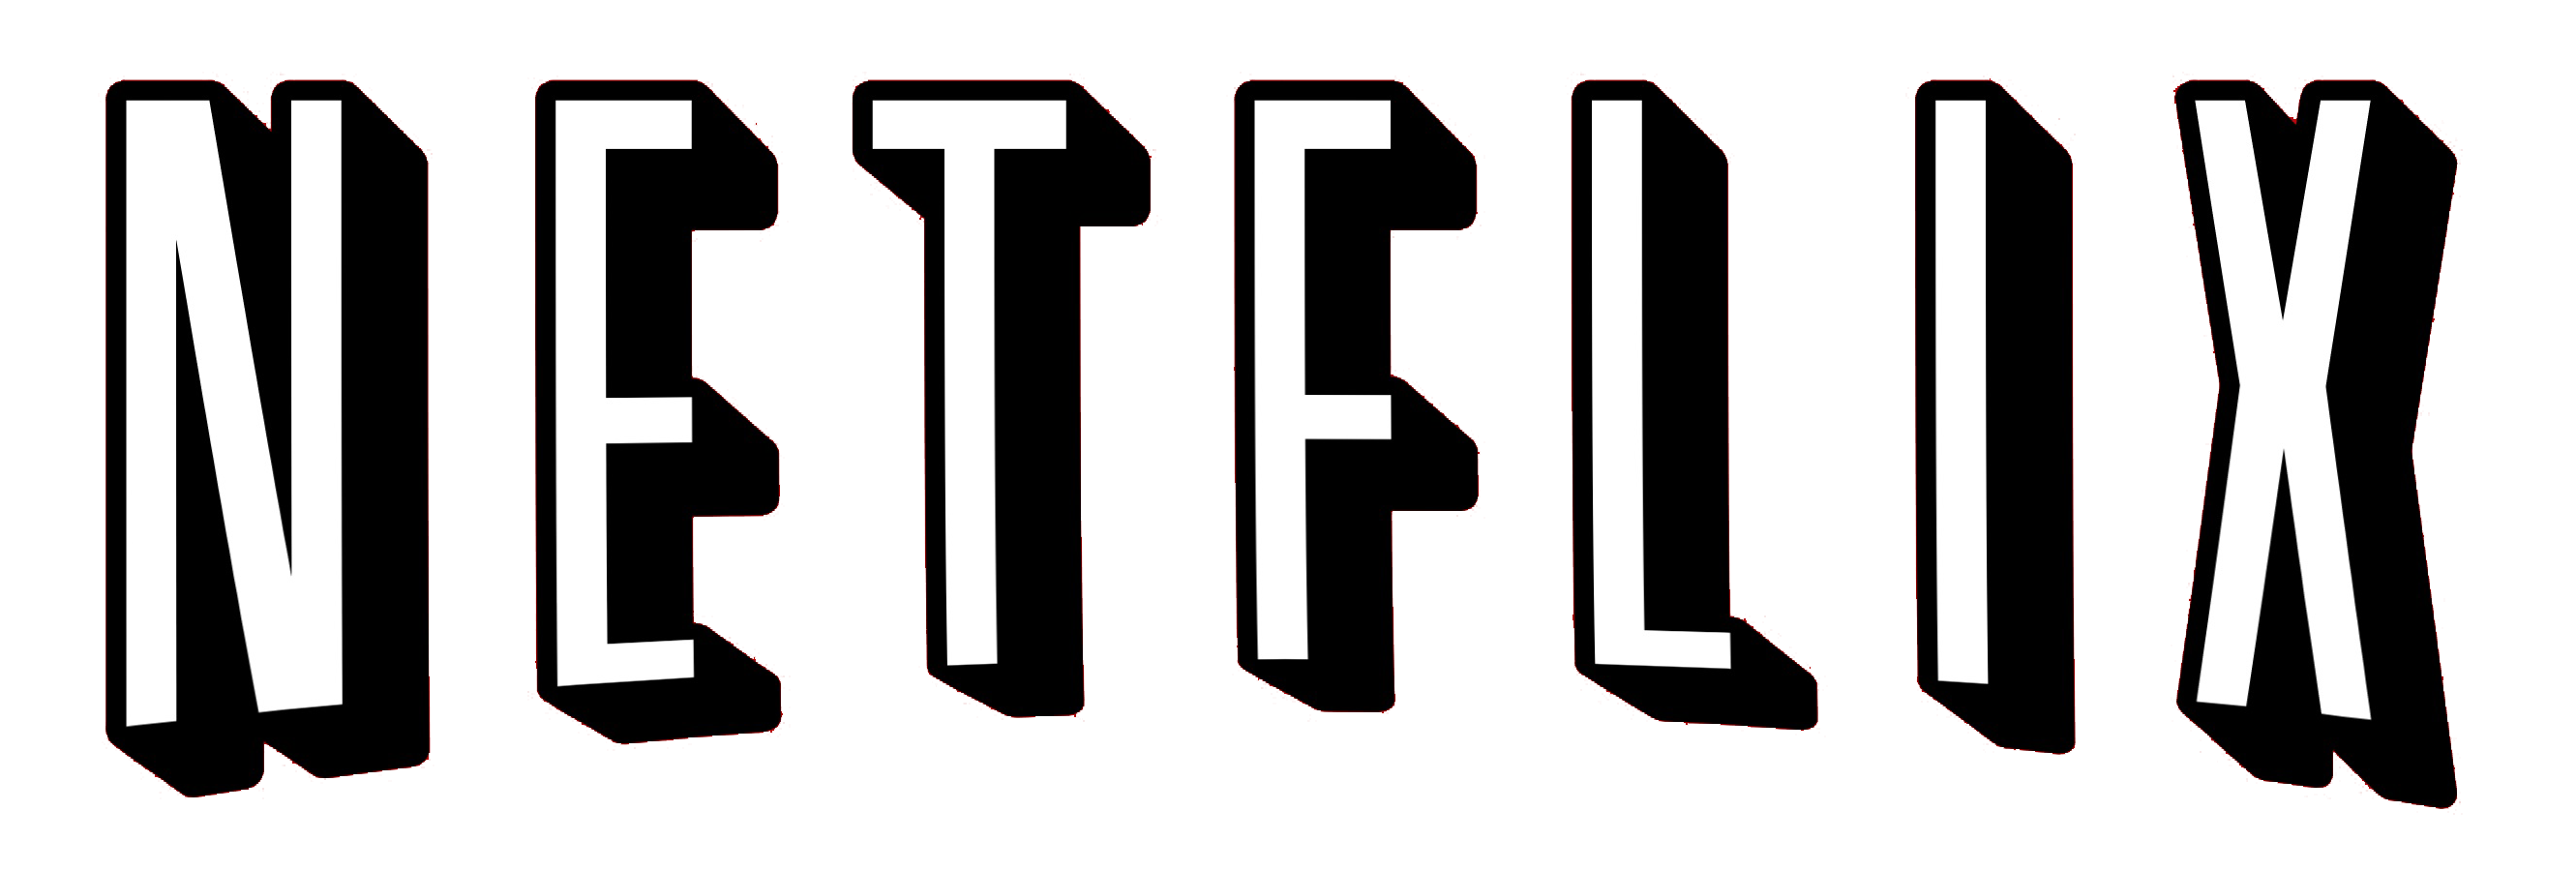 movies and shows leaving netflix inc nasdaqnflx